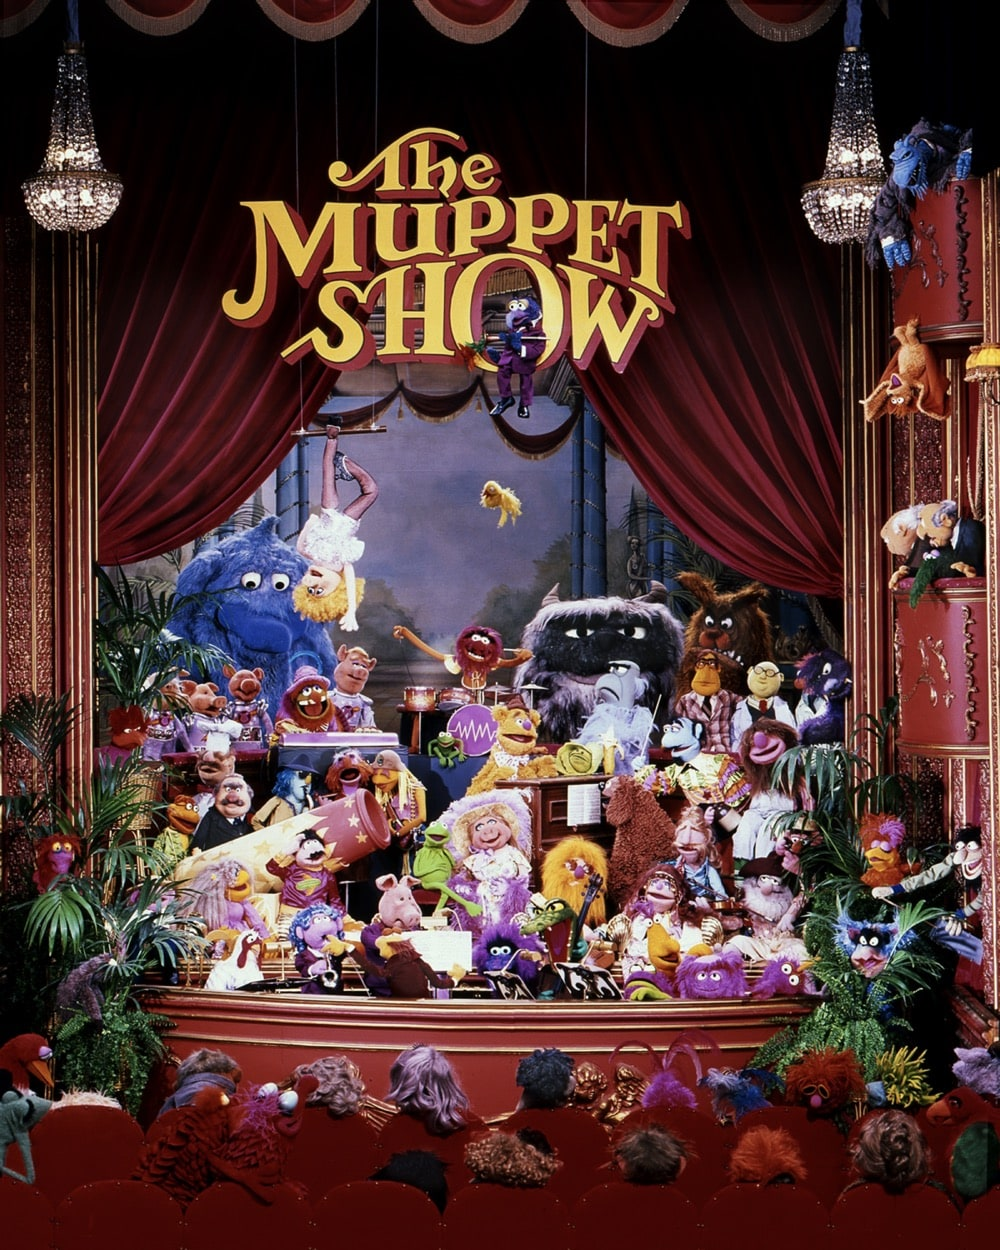 The Muppet Show Disney+